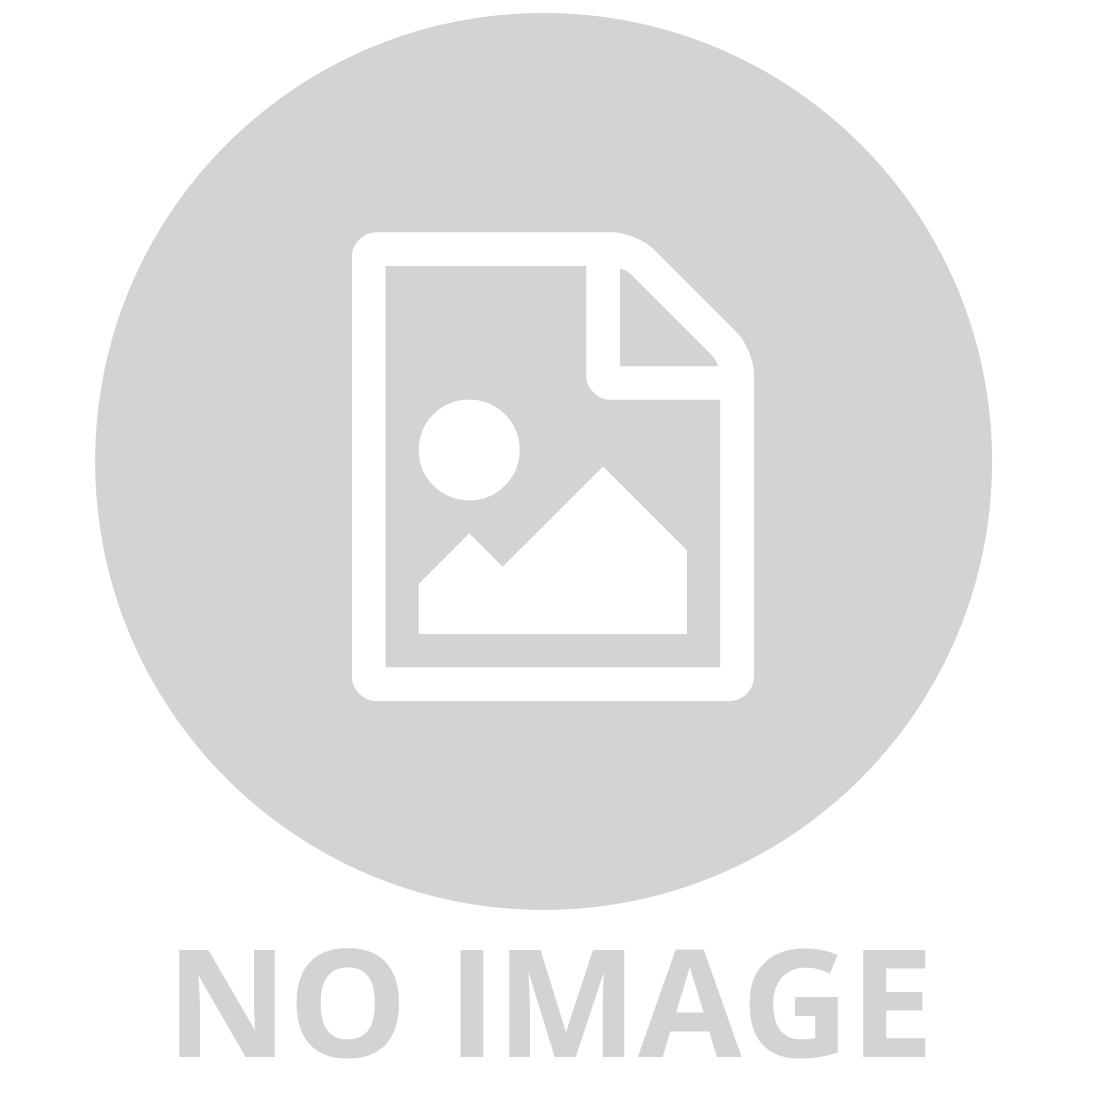 TOP RACER 1:43 ALFA ROMEO POLICE CHASE SLOTCAR SET